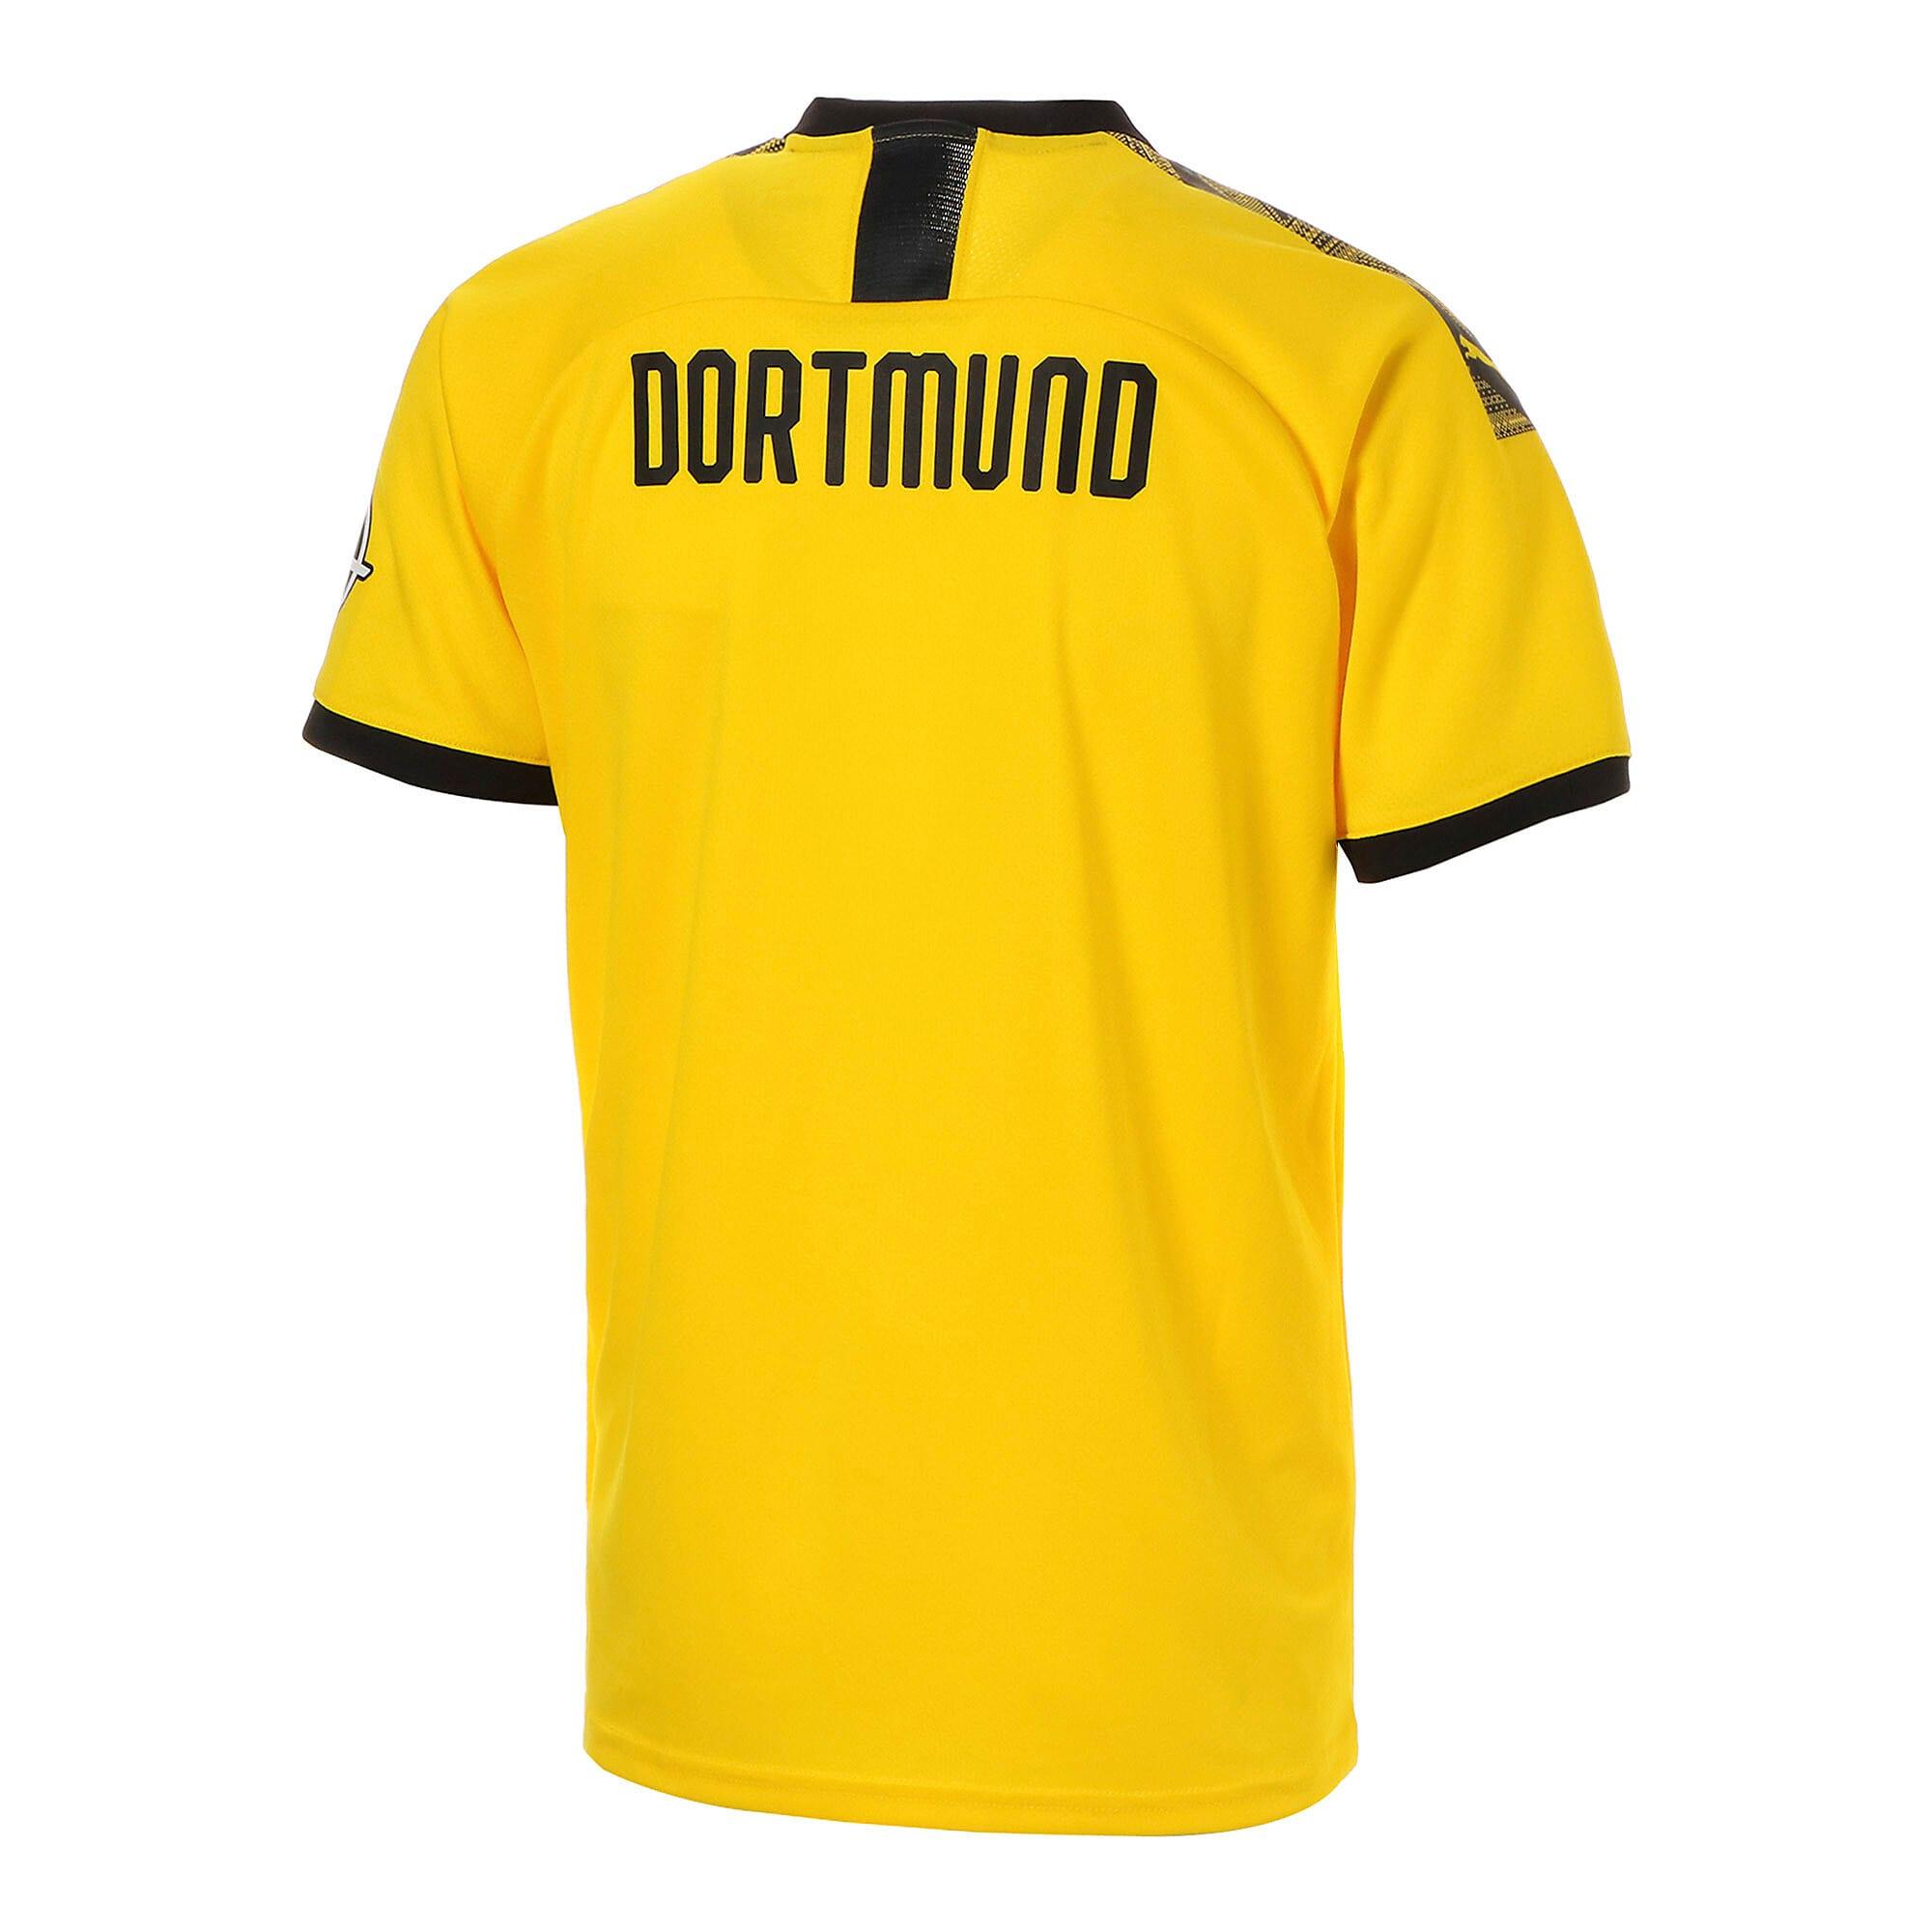 Thumbnail 3 of ドルトムント BVB SS ホーム レプリカシャツ 半袖, Cyber Yellow-Puma Black, medium-JPN